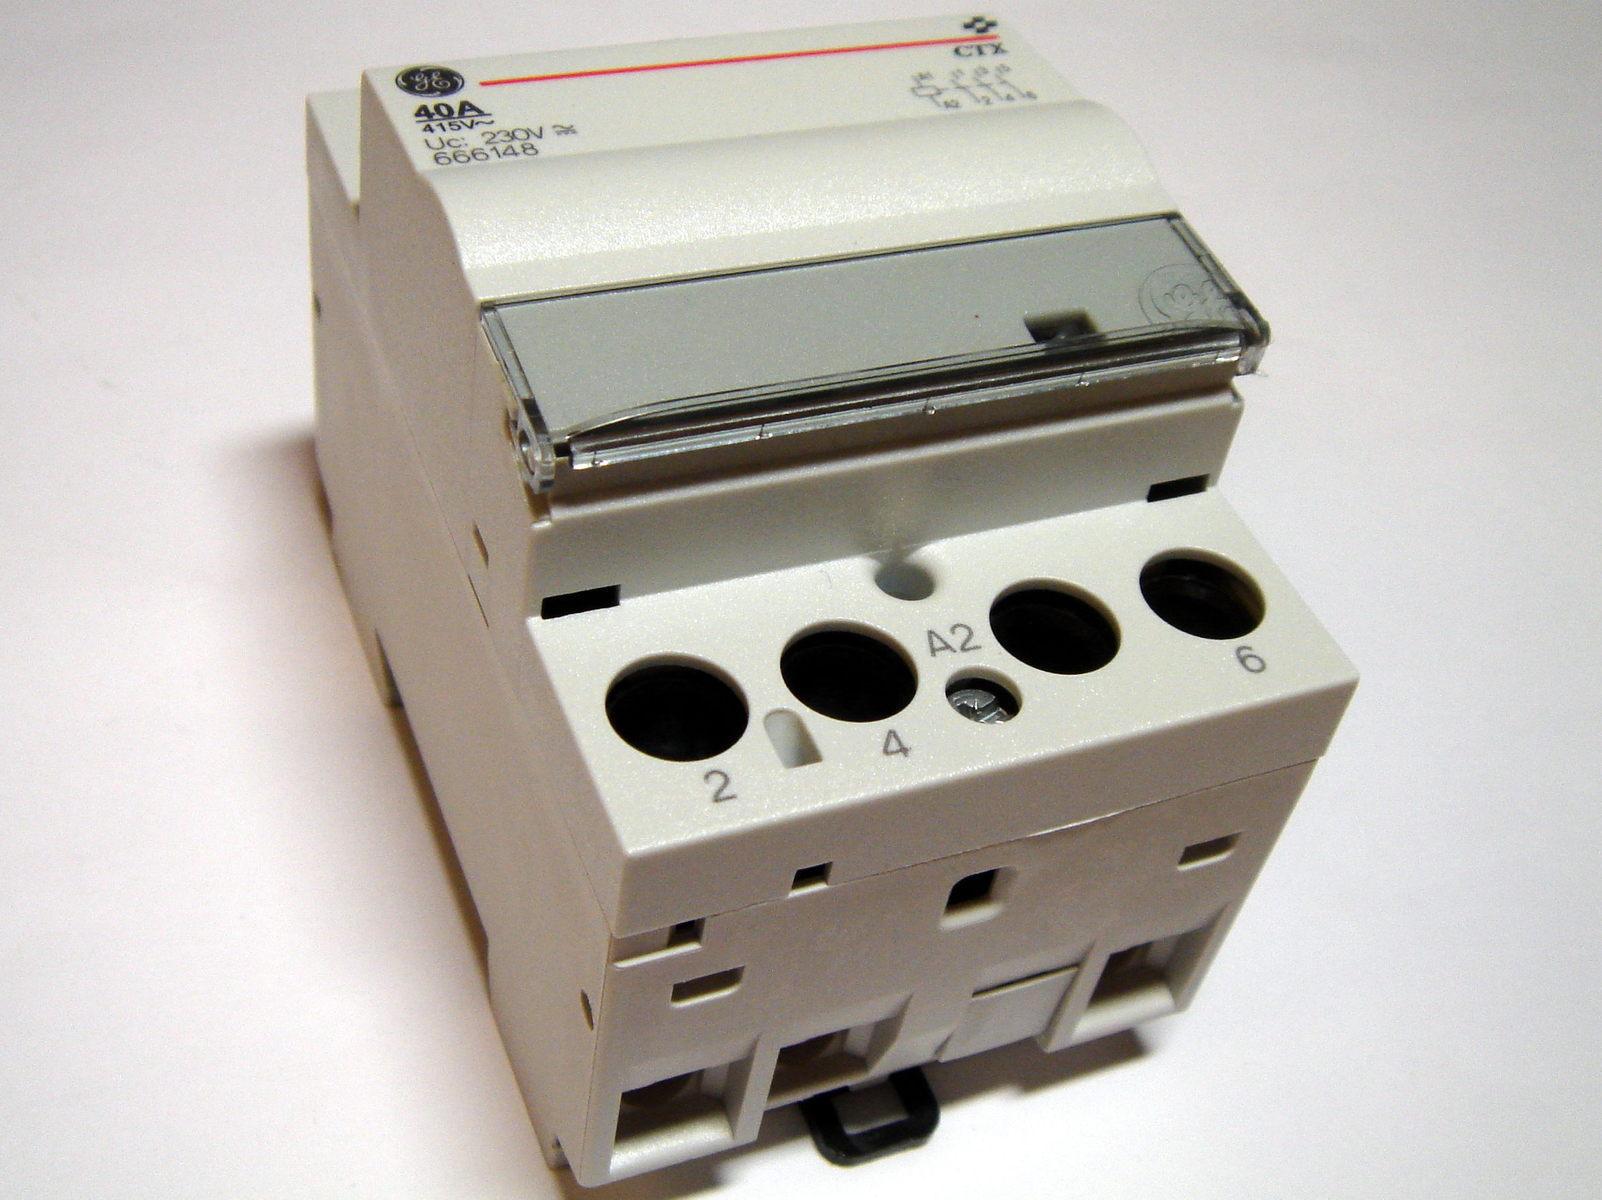 Moodulkontaktor 3-faasiline 40A(26kW), CTX 403052, General Electric, 666148